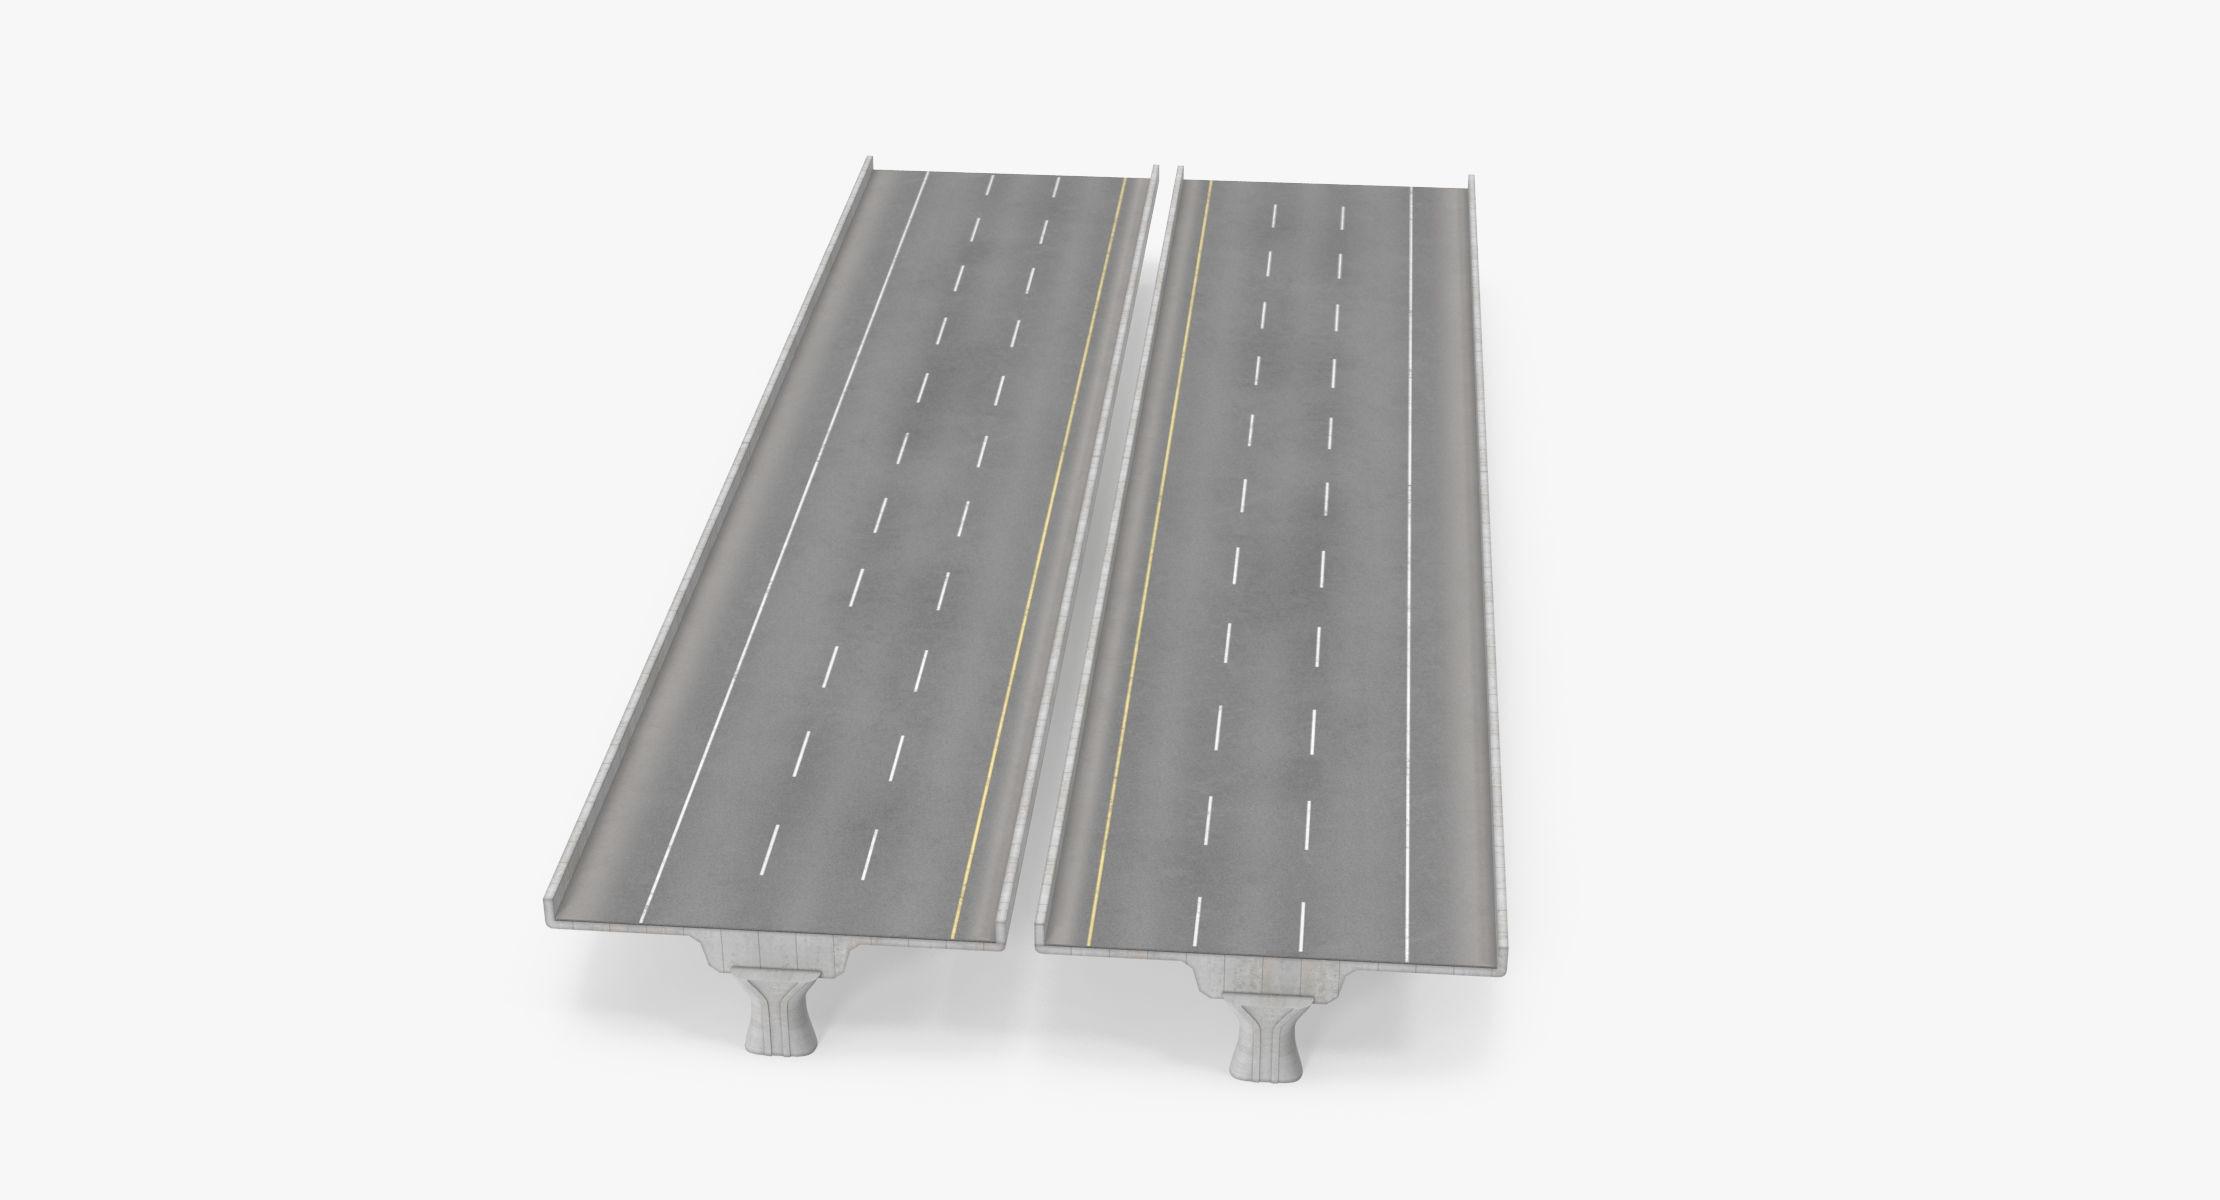 3 Lane Raised Highway Straight - 5m - reel 1